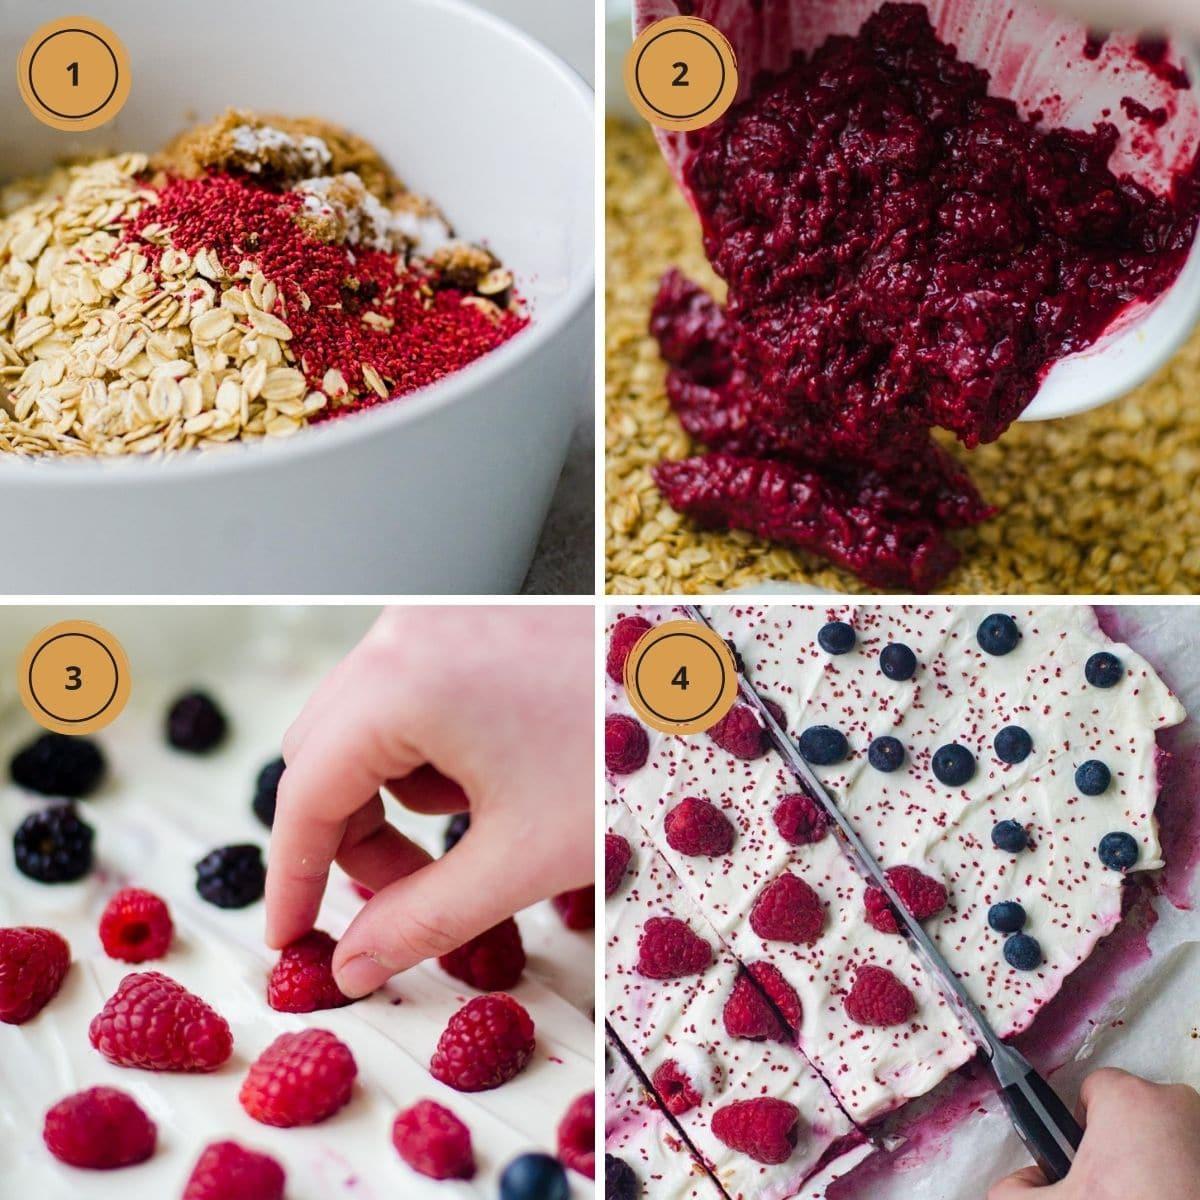 Four pictures showing steps to make greek yogurt bars.